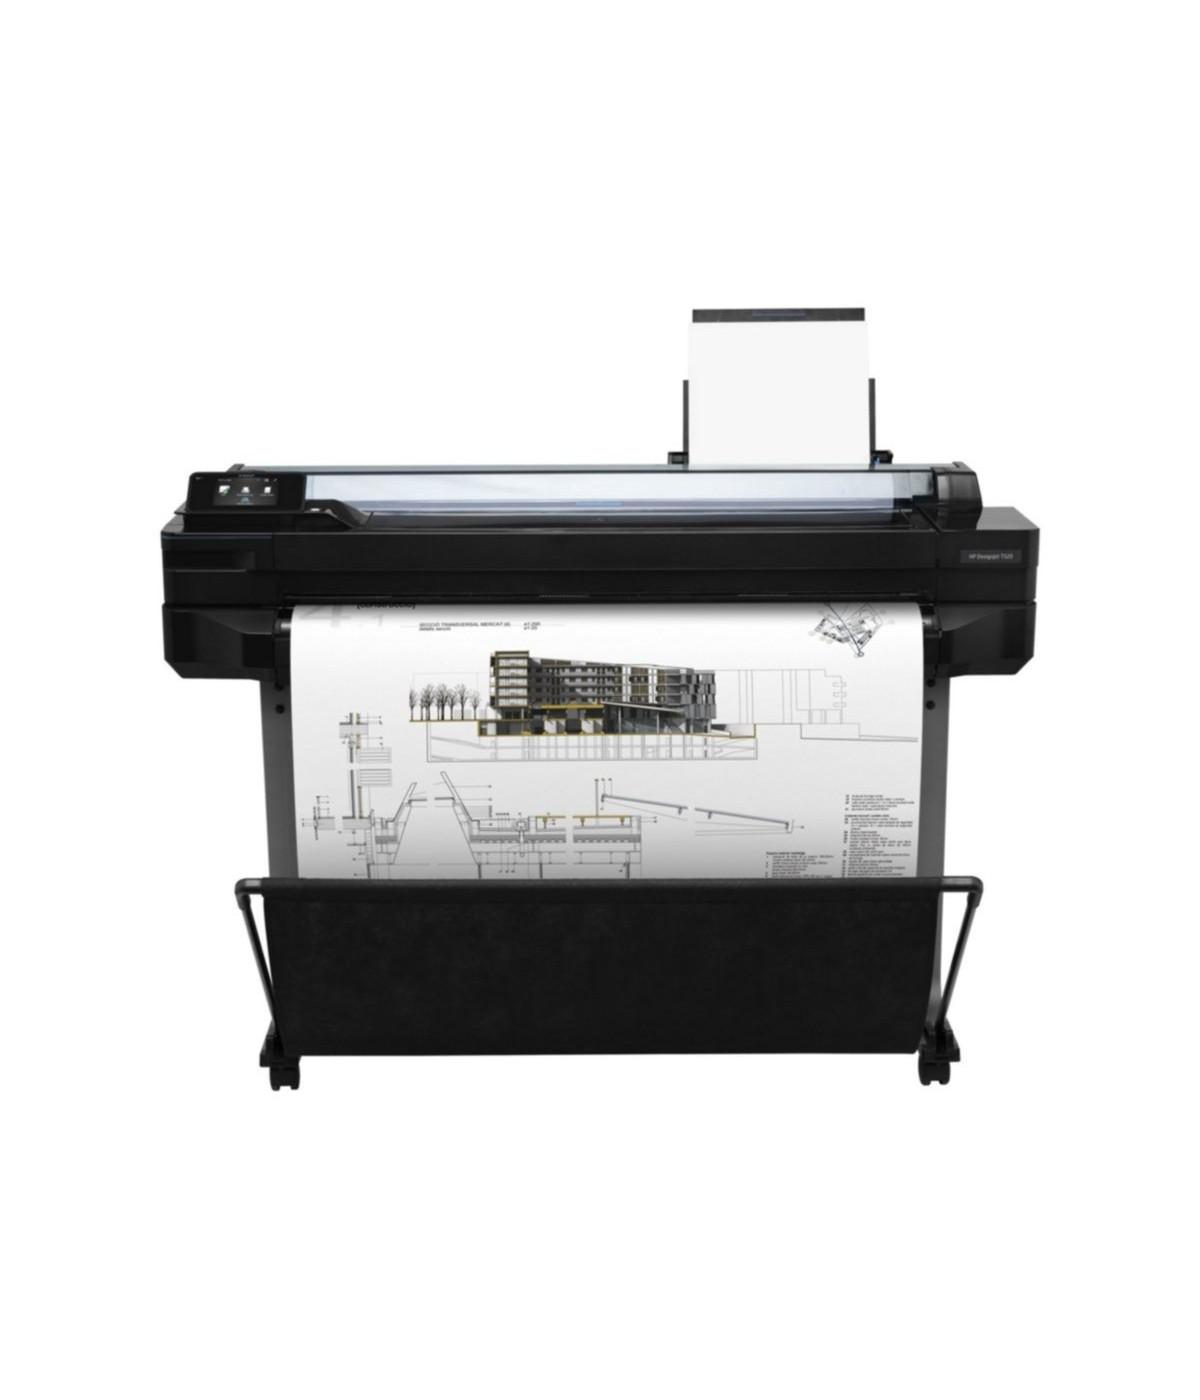 IMPRESORA PLOTTER HP DESIGNJET T520 CQ893B